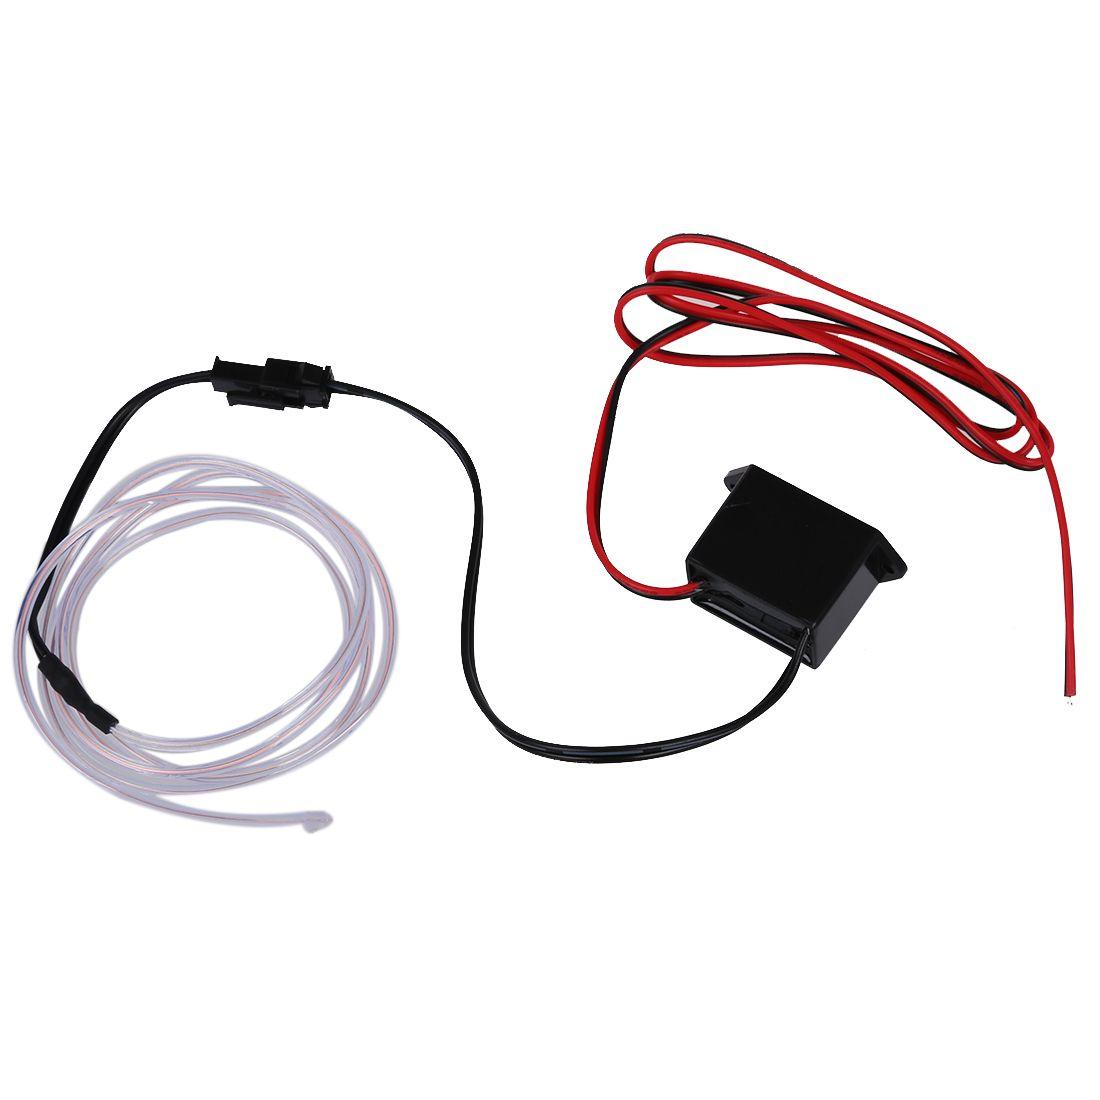 LED Flexible EL Wire Neon Glow Tube Lamp Light 12V, 1M White | Car ...